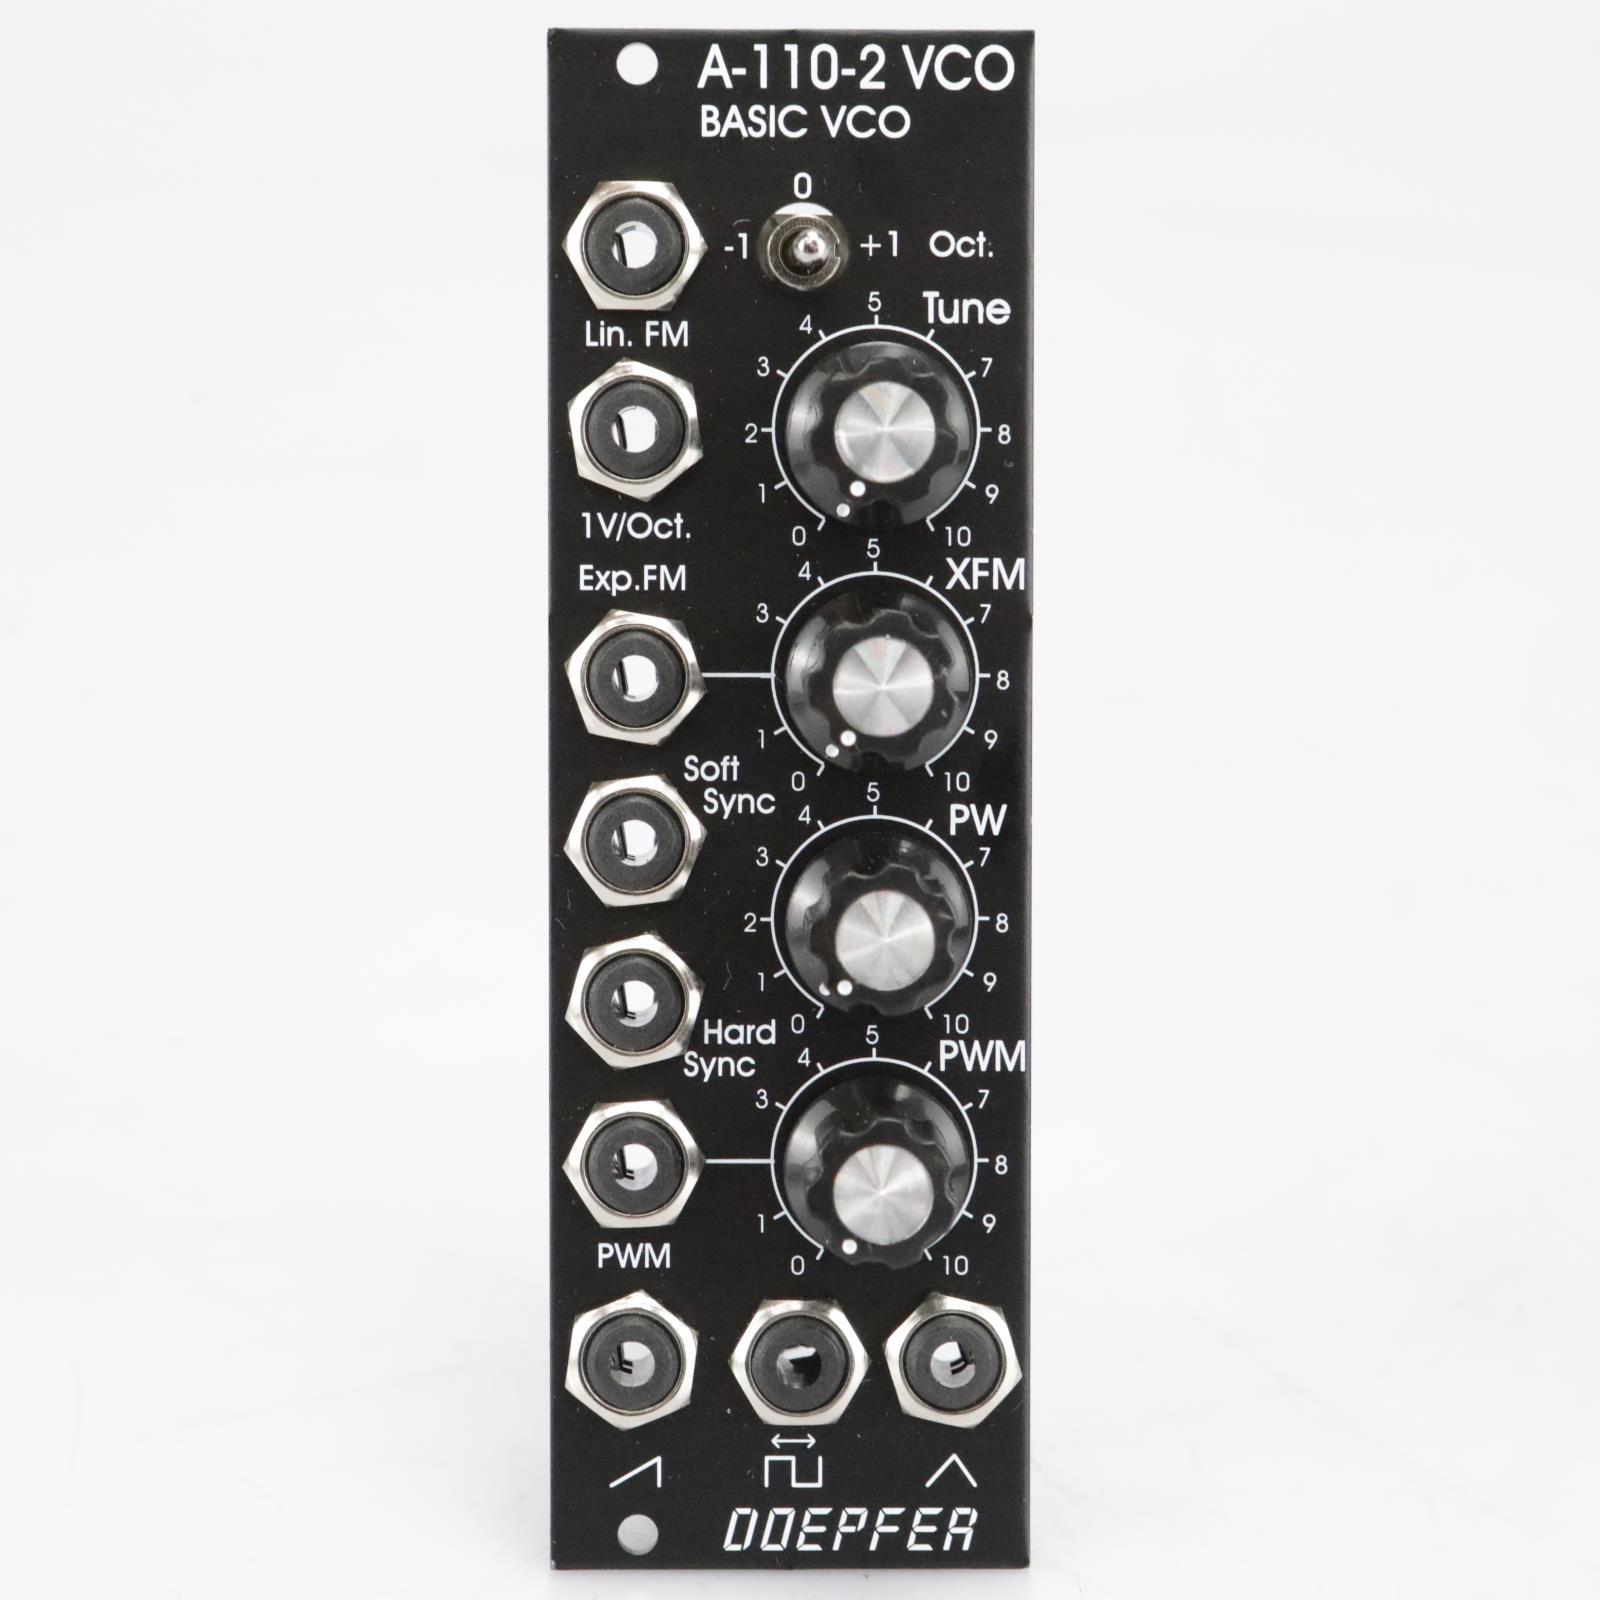 Doepfer A-110-2 VCO Eurorack Module #41011